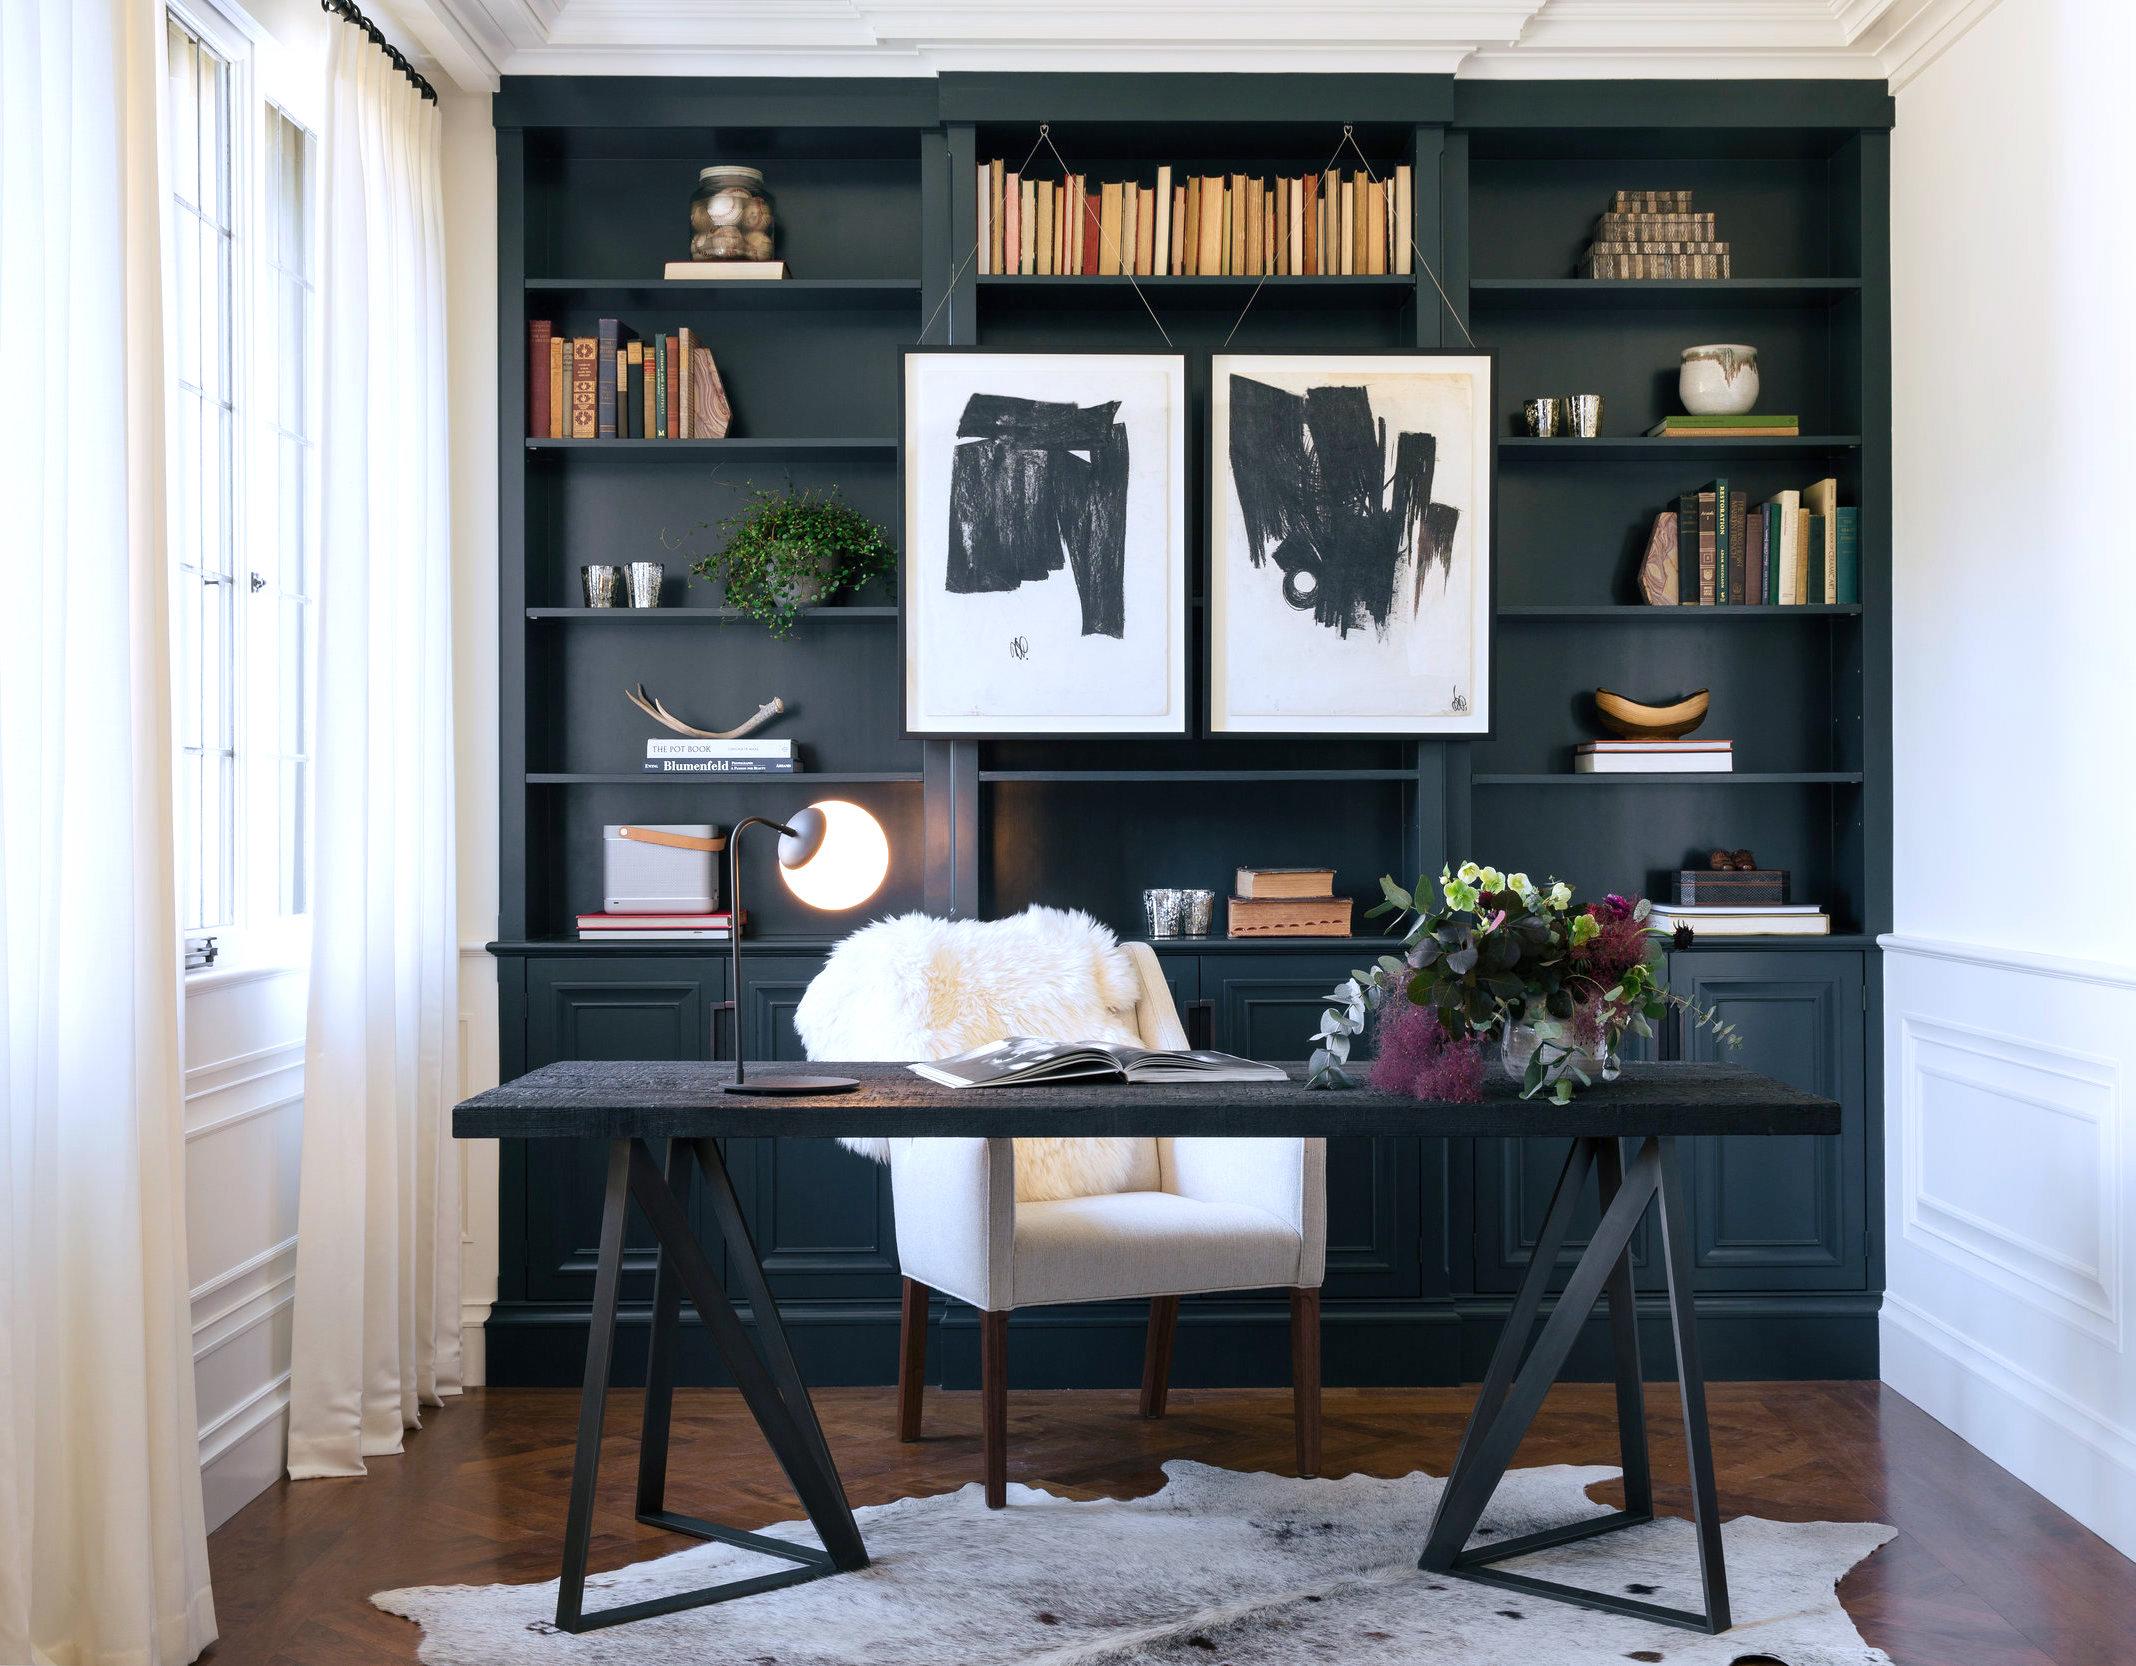 cowhide office chair uk lightweight camping feature walls that make a stunning design statement